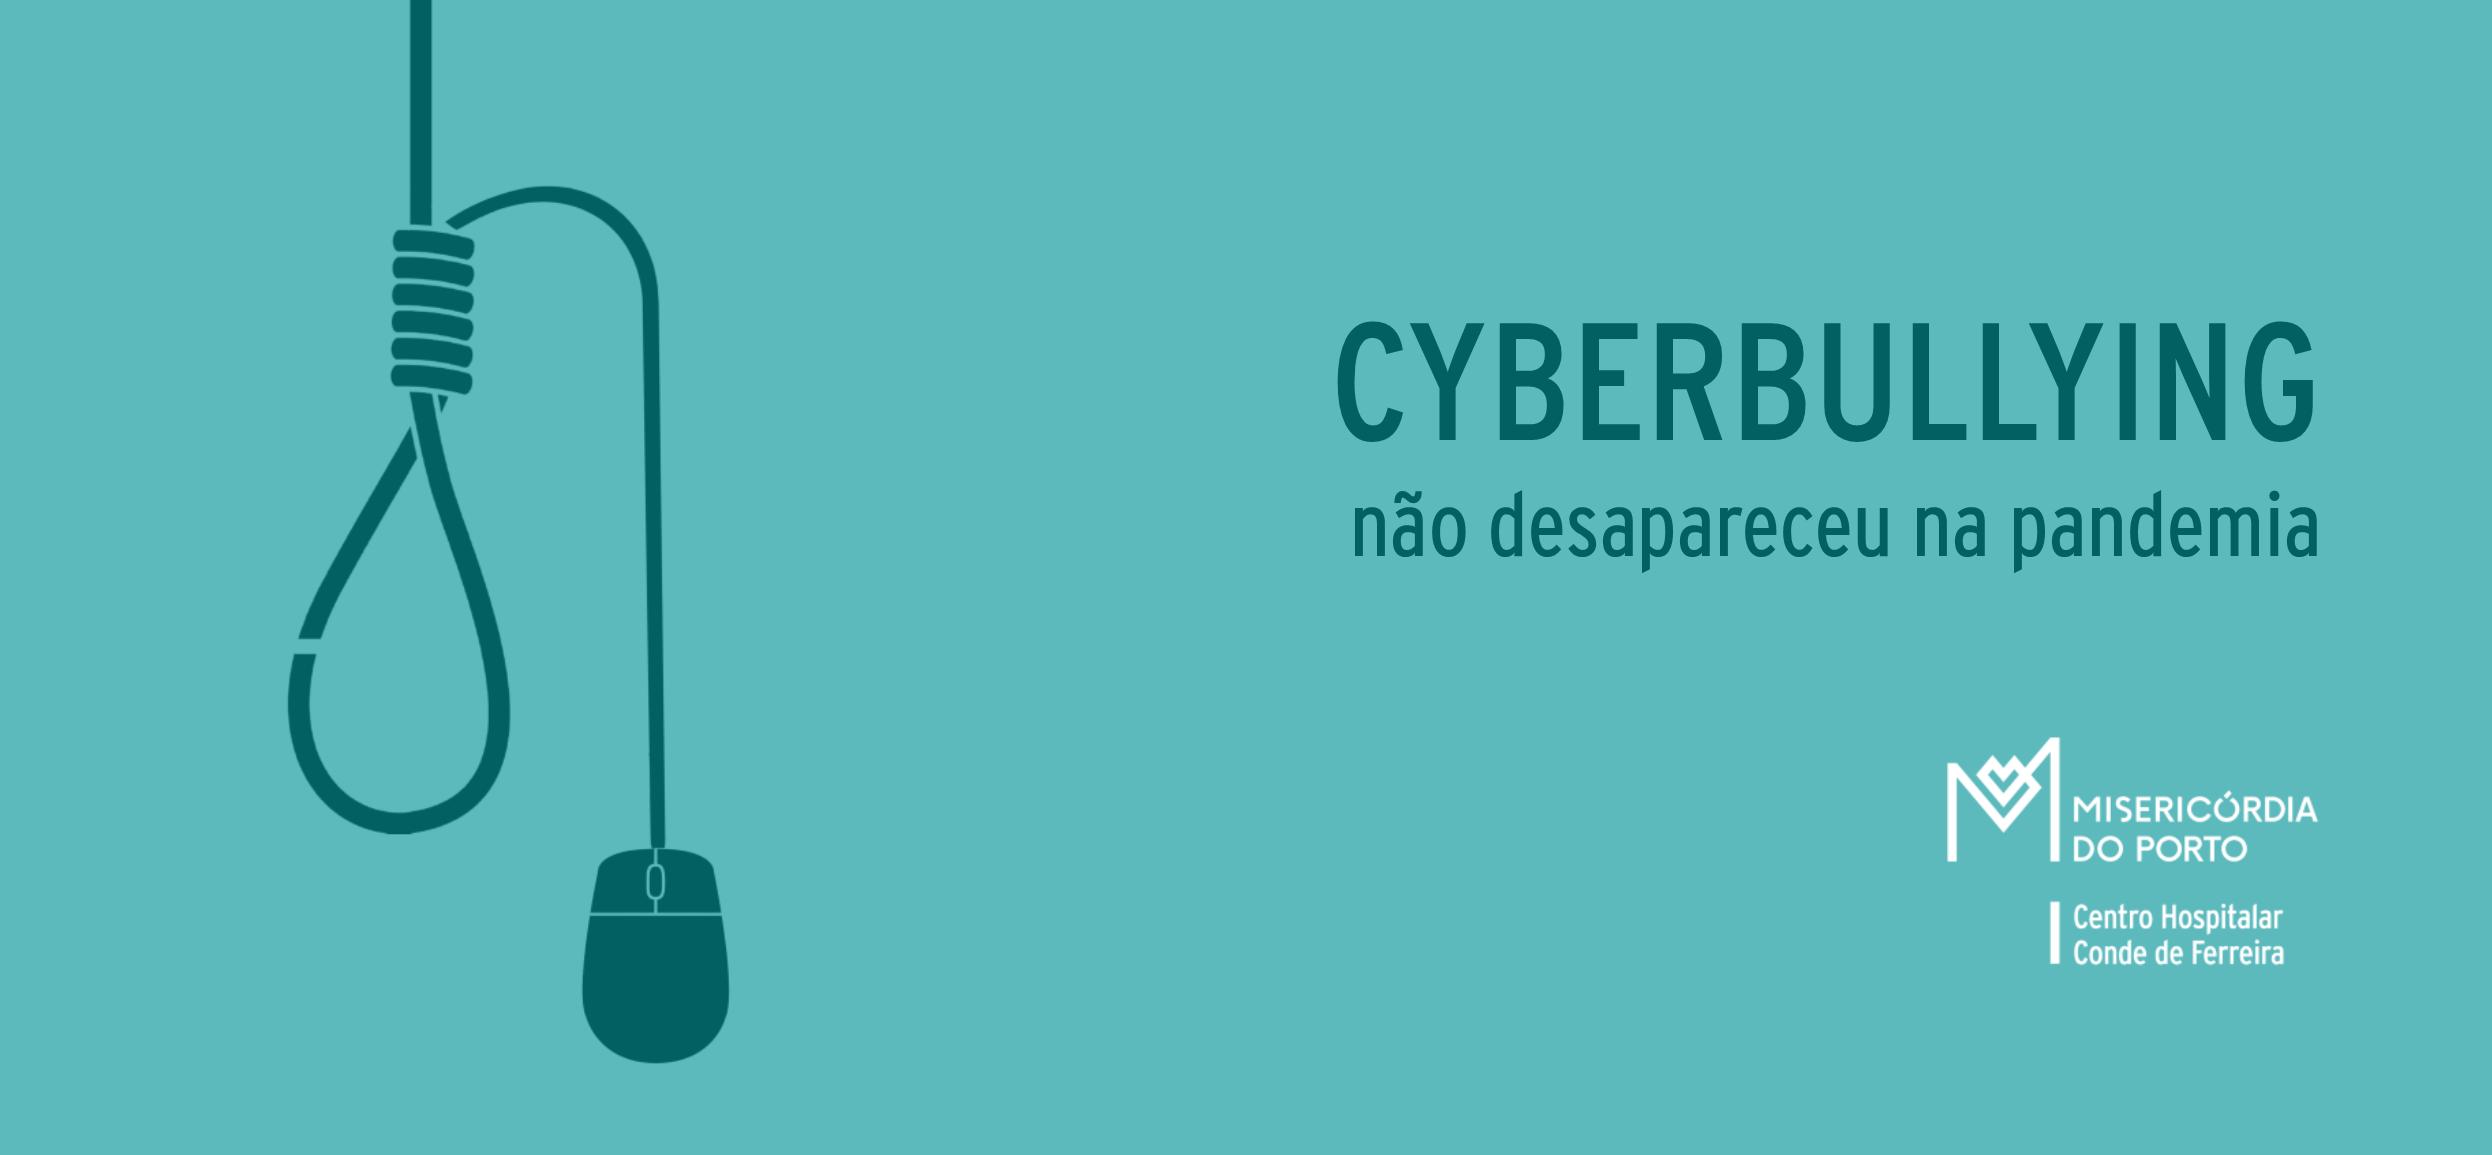 https://portaldasaude.scmp.pt/assets/misc/img/Not%C3%ADcias/2020/2020-11-05%20Ciberbulling/banner%20ciber.png